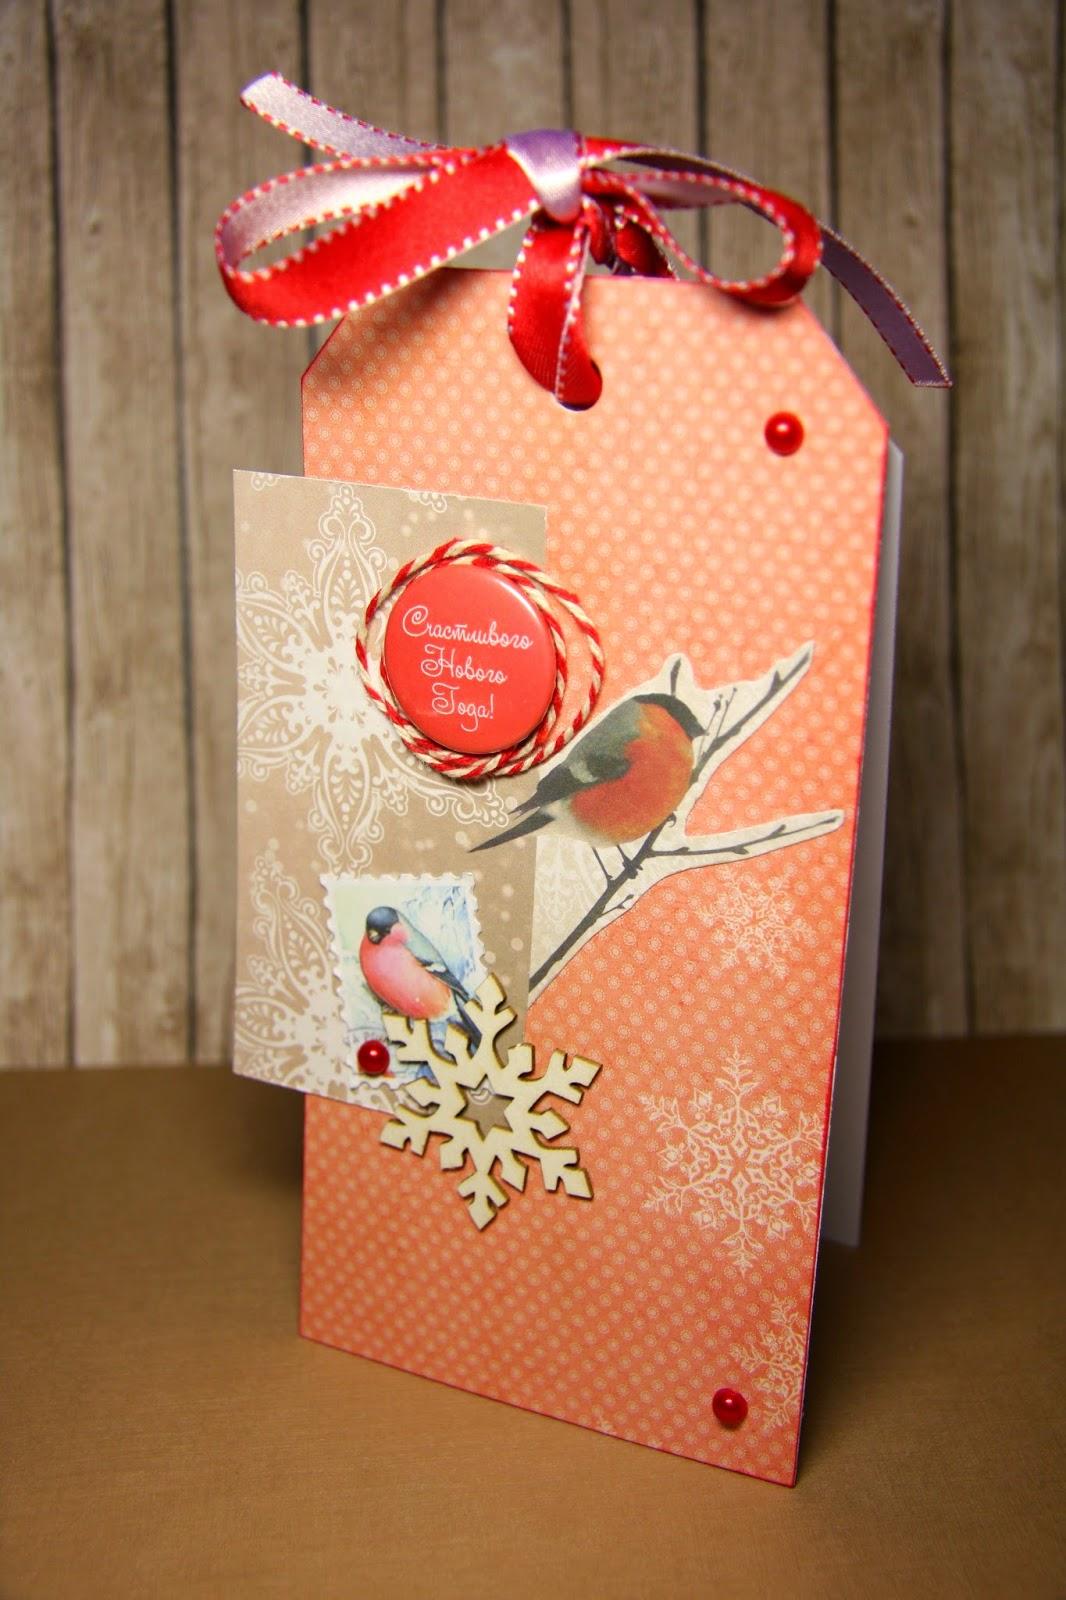 тег новый год открытка скрапбукинг scrapbooking new year tag card hamster-sensey